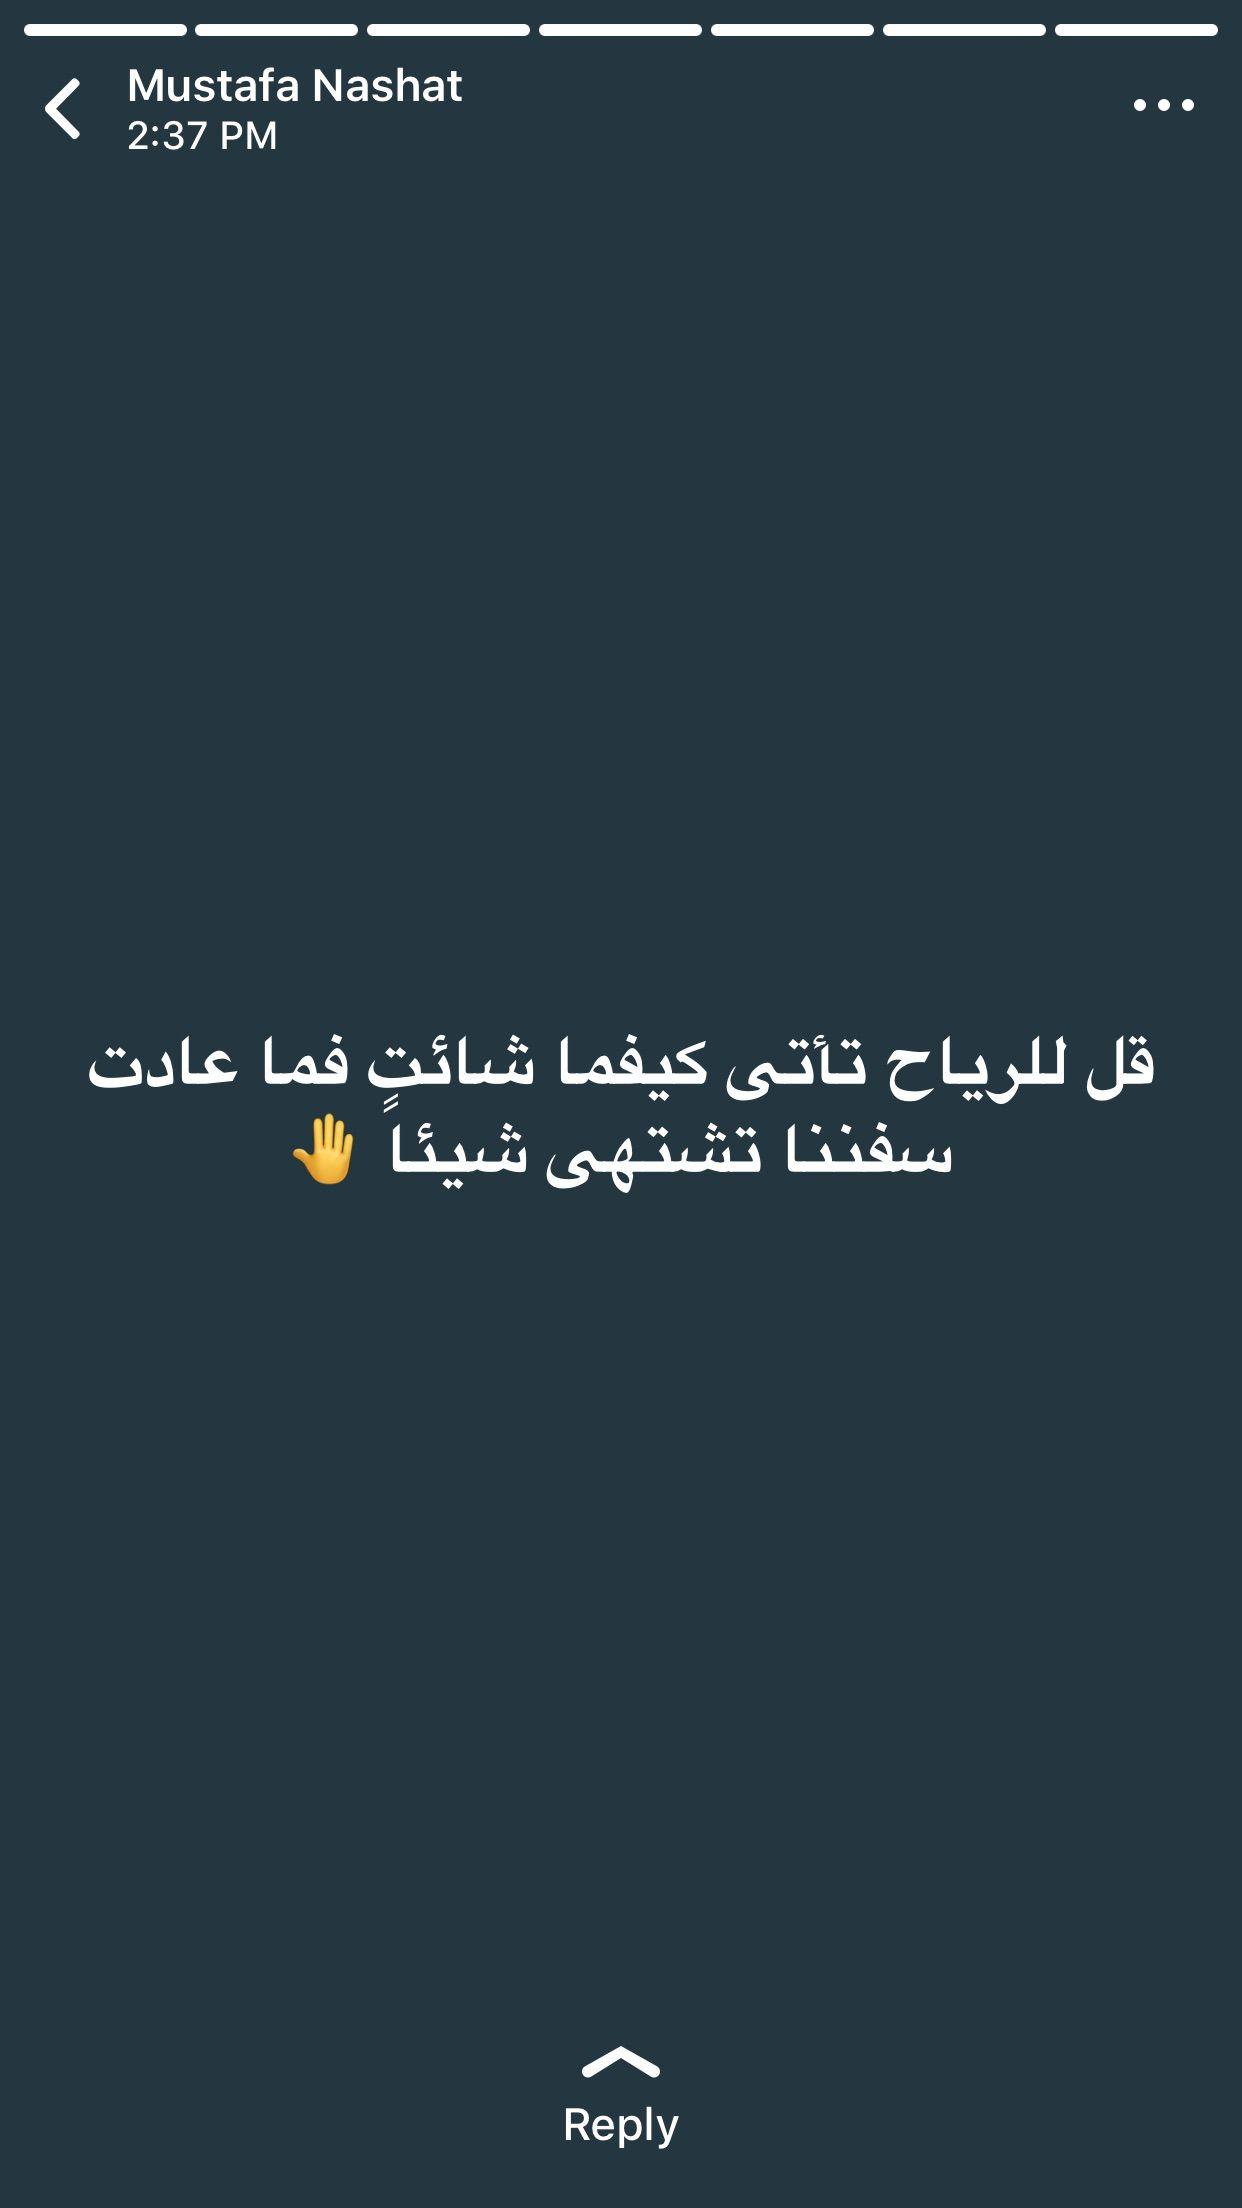 فقد ذهب مني كل غالي ماعاد يهم Arabic Quotes Talking Quotes Sweet Words